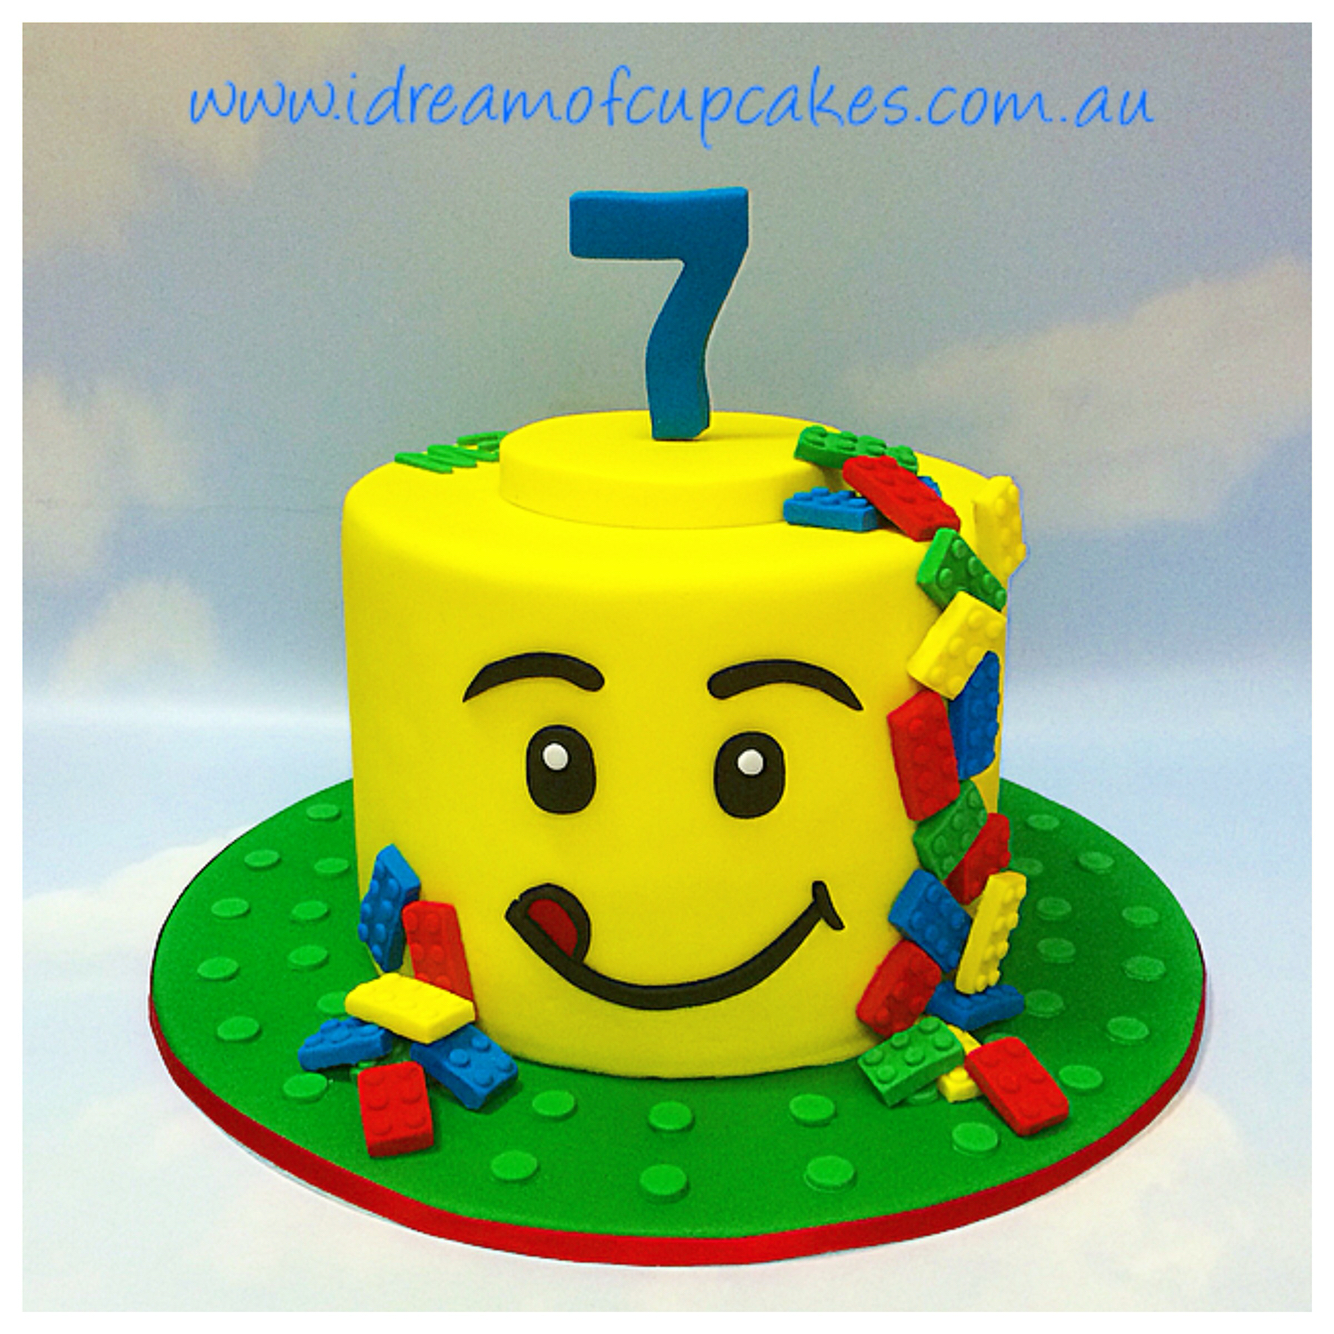 Lego Head Cake 5th Birthday Cake Boys Kaans Birthday Deas